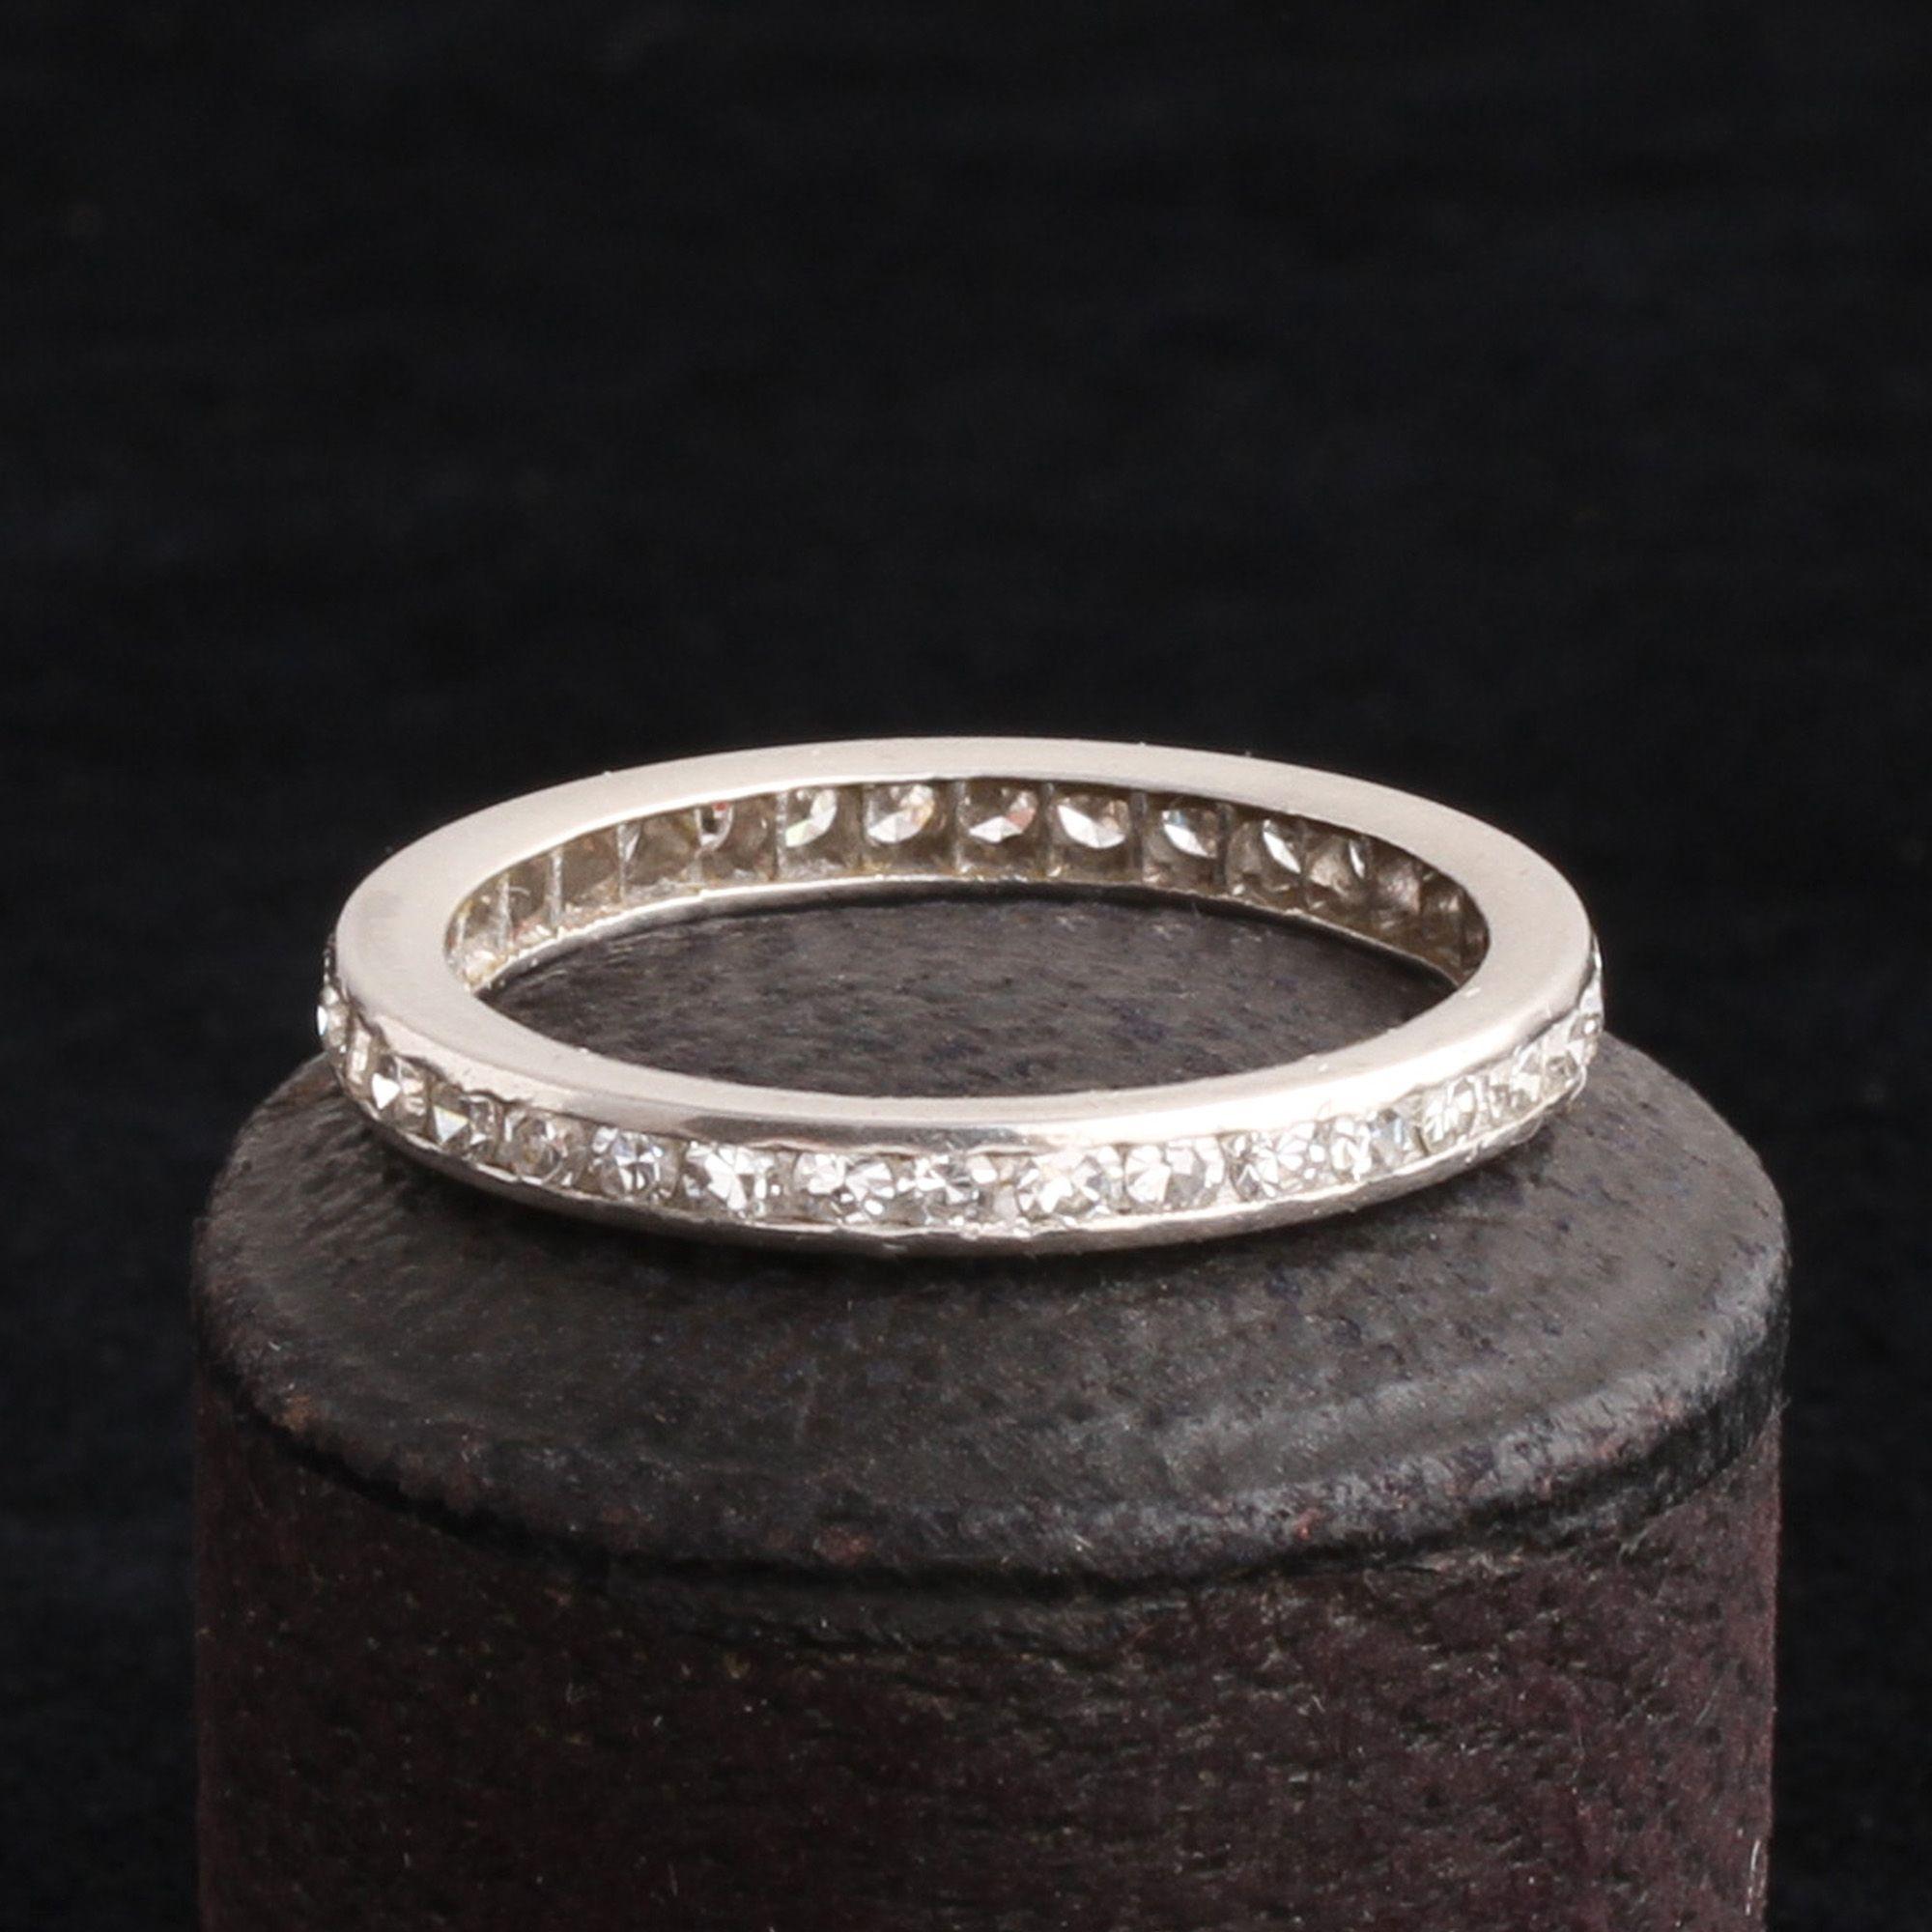 Platinum Eternity Ring with Single Cut Diamonds Size 6.5